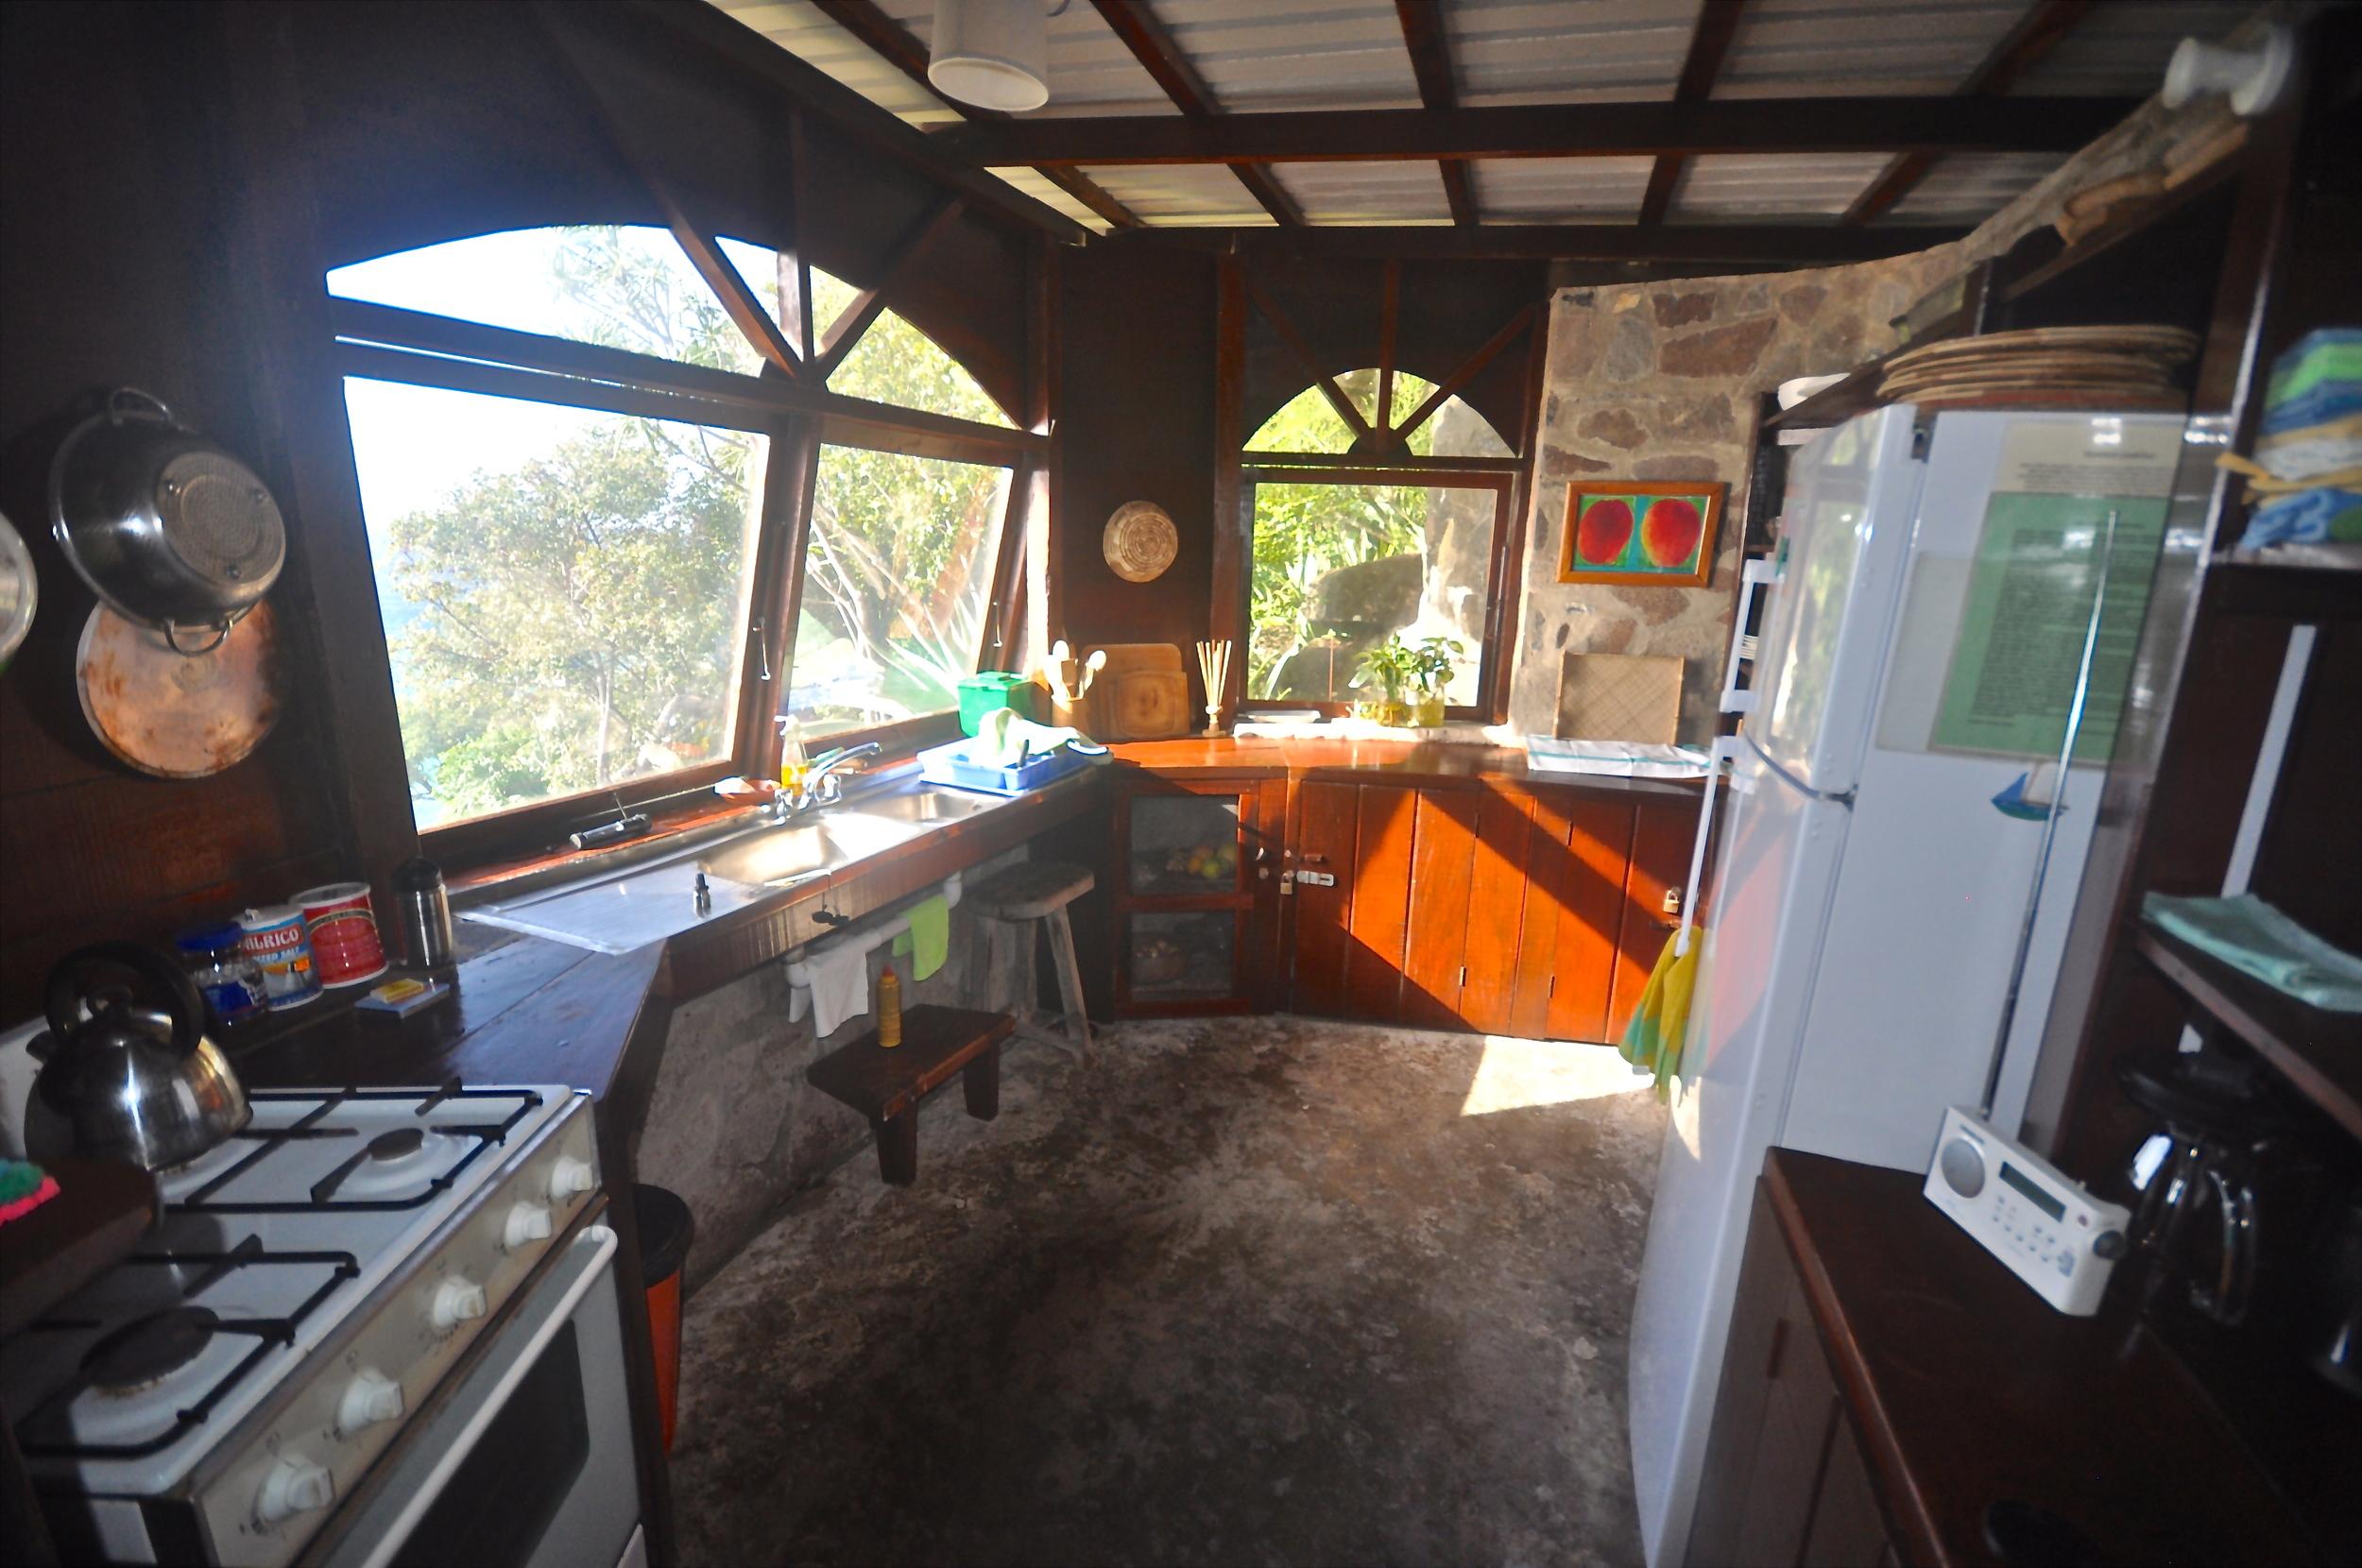 Agnew Hall Kitchen.JPG